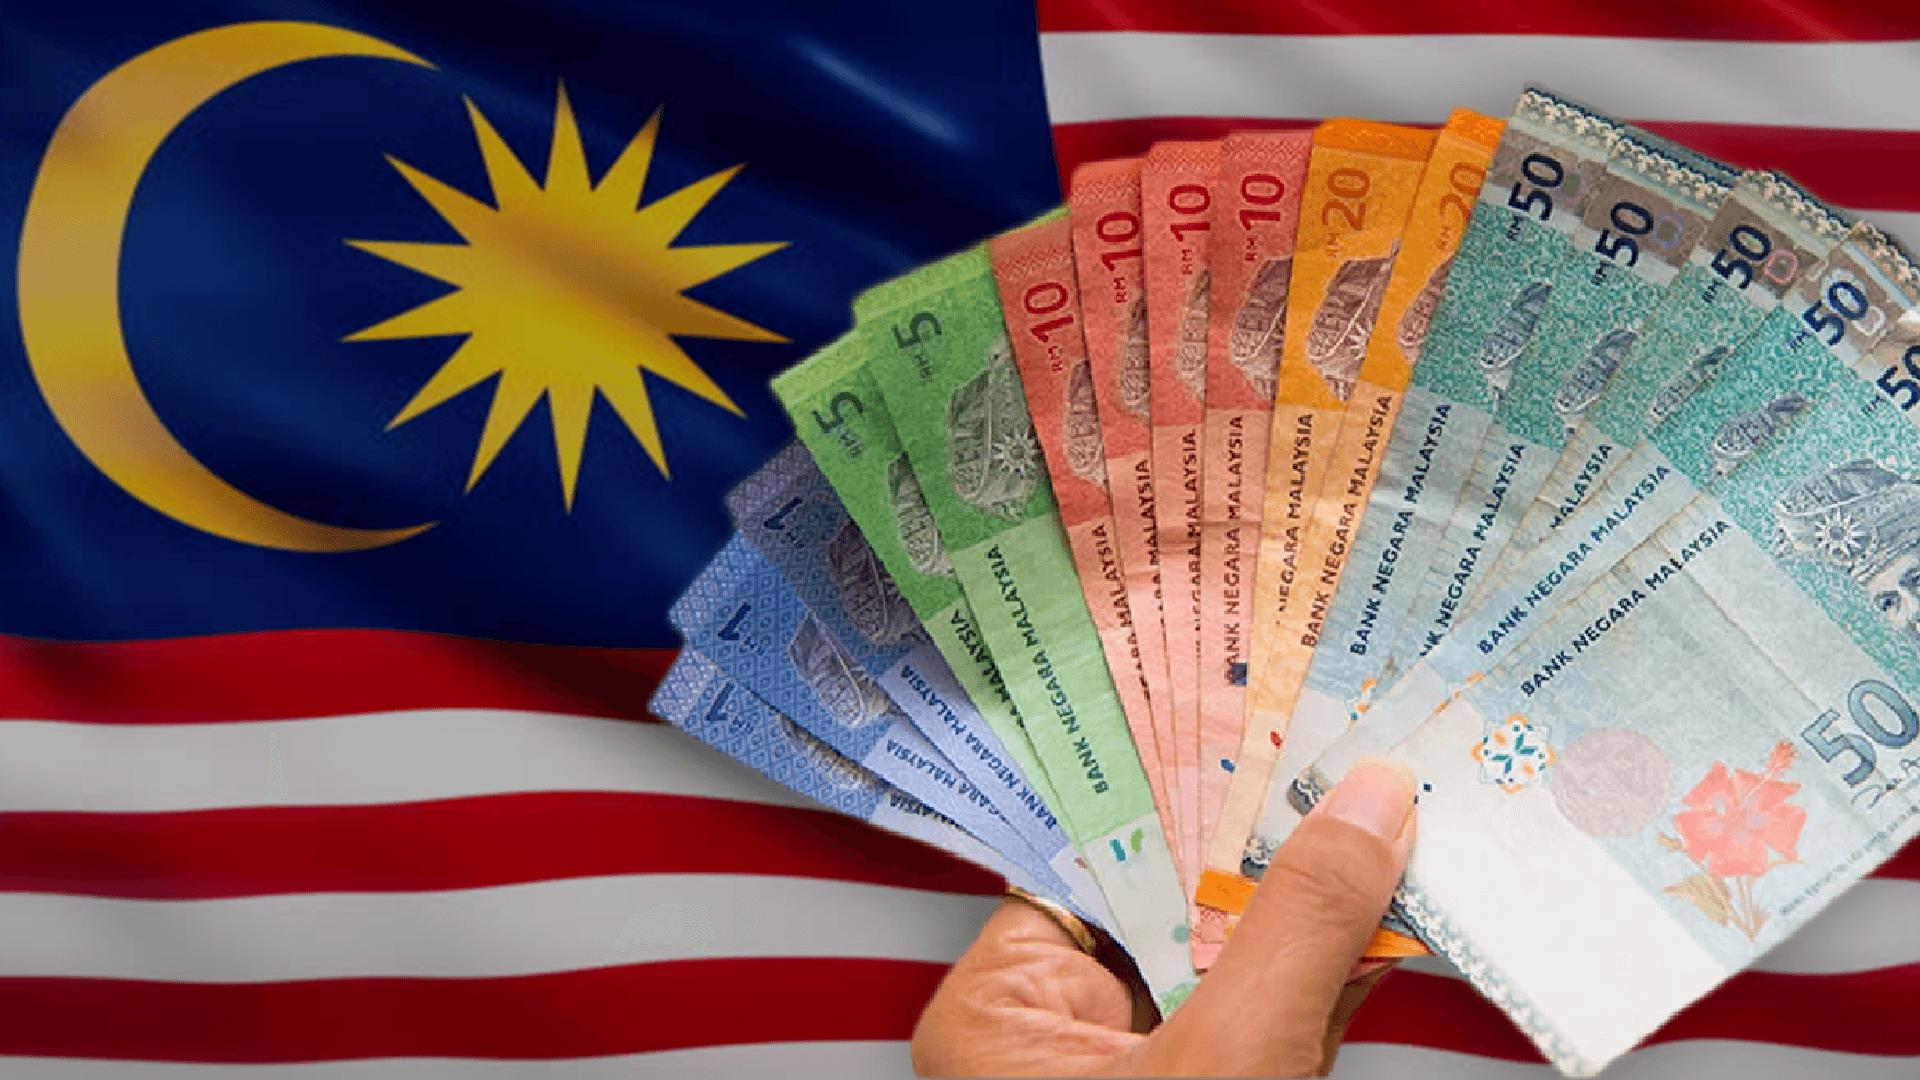 Nilai Malaysia banding Indonesia, Singapore dan Philippines